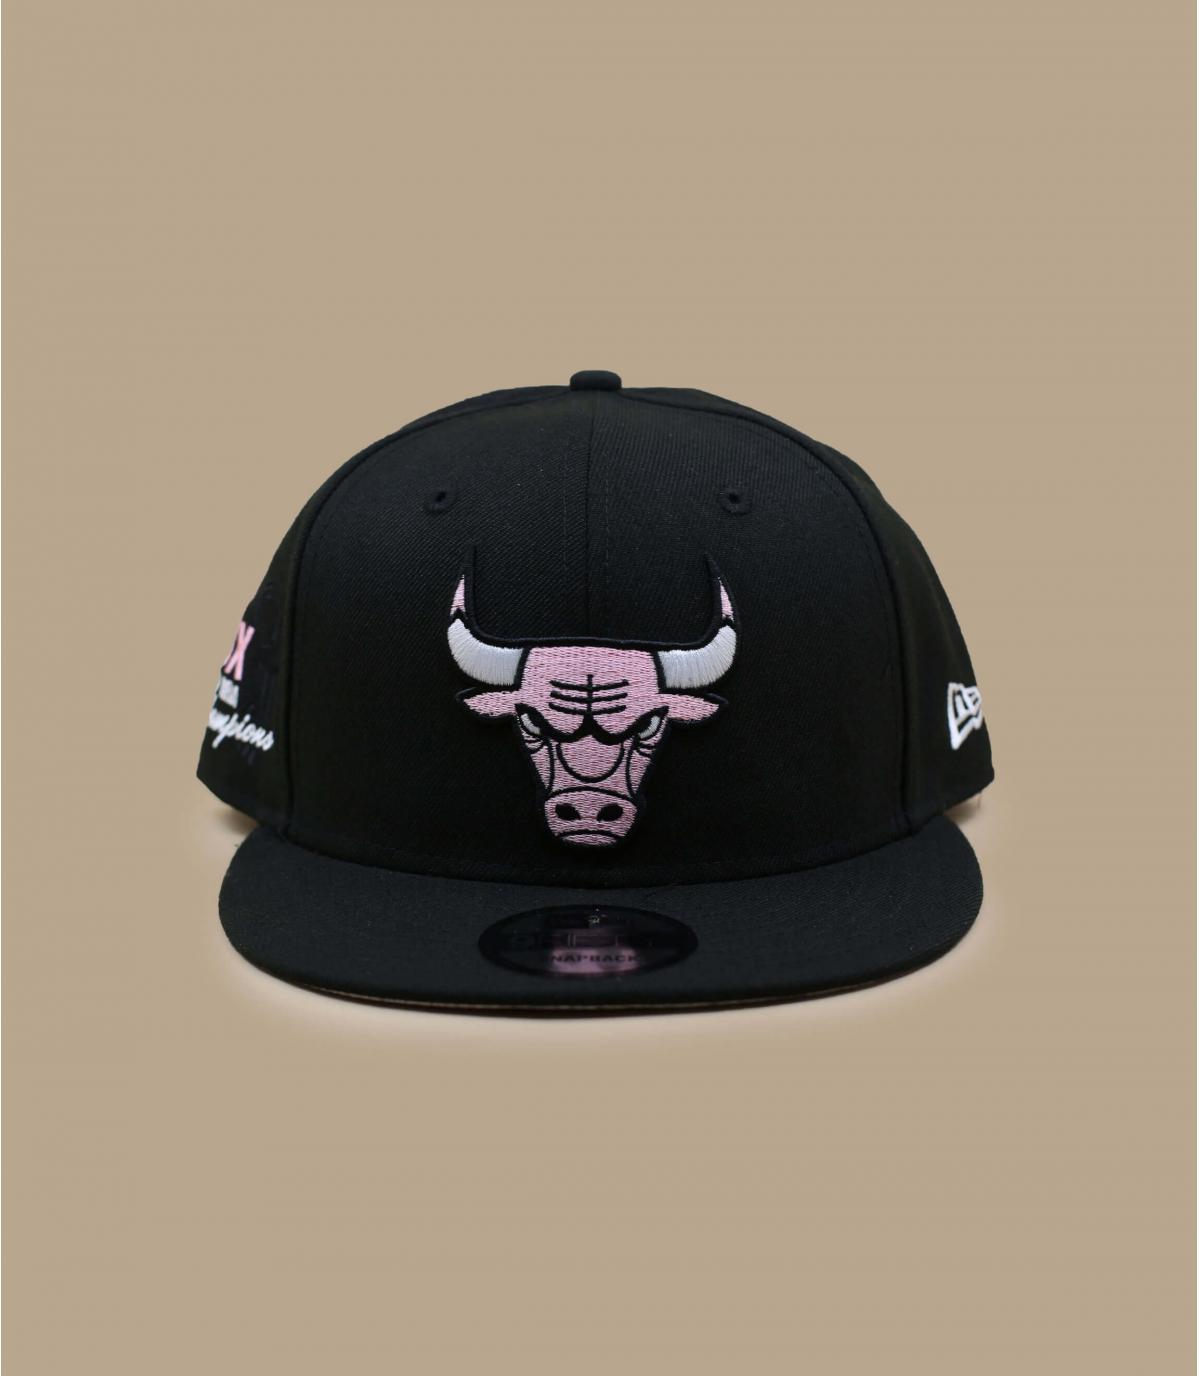 Détails Snapback Quickturn Paisley Bulls 950 black pink - image 2